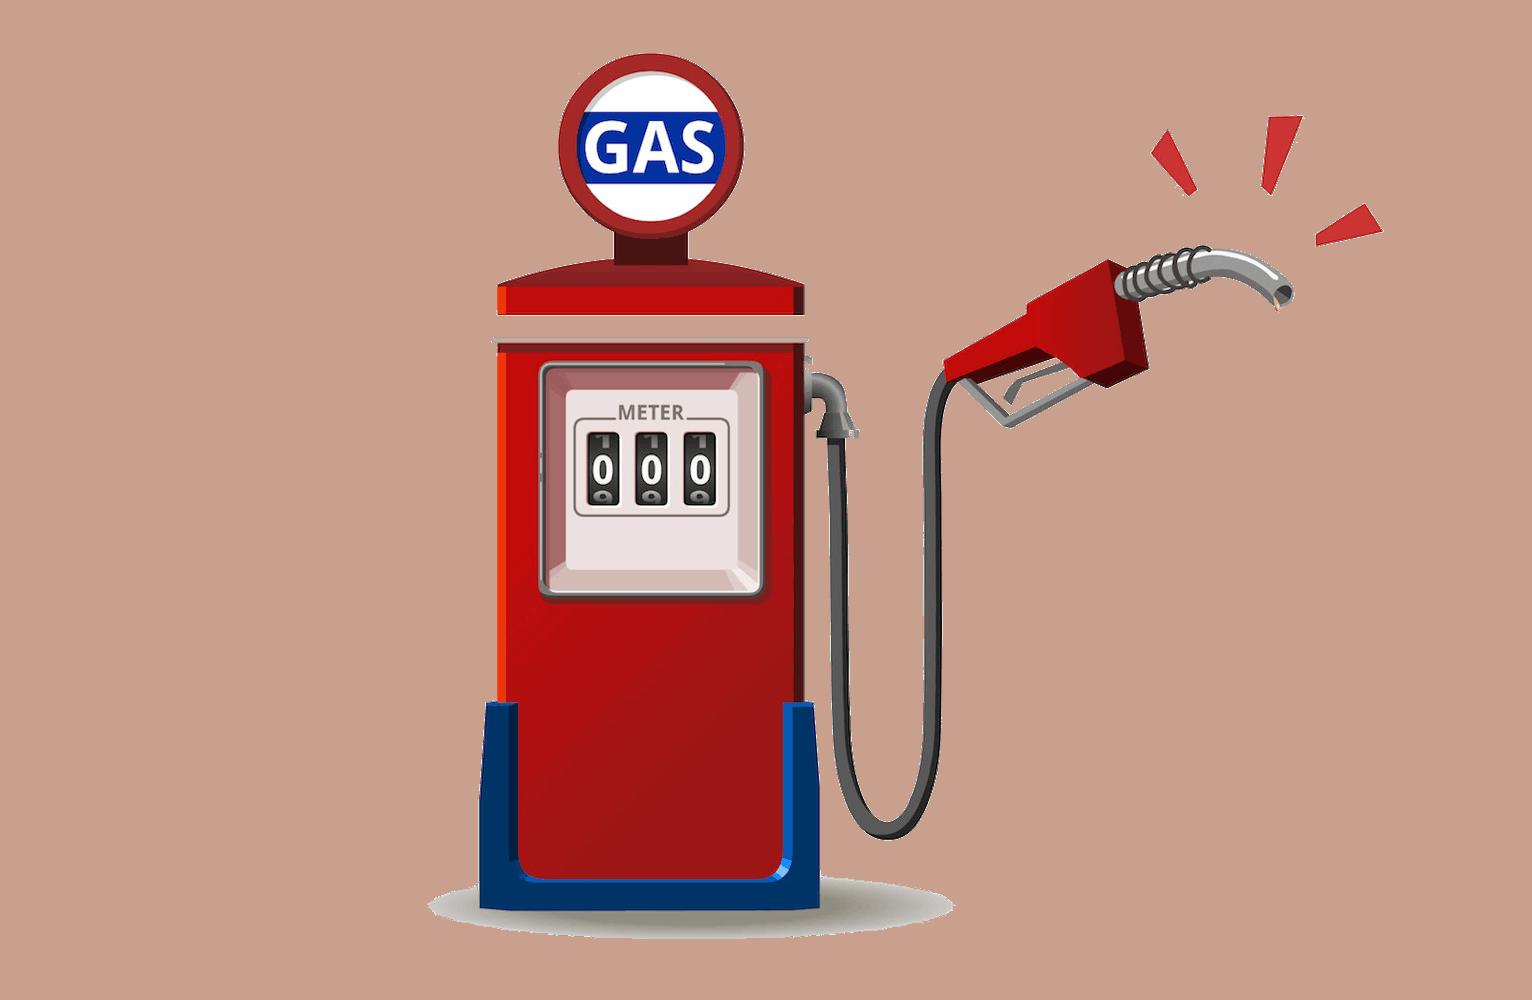 ether gas bränsle